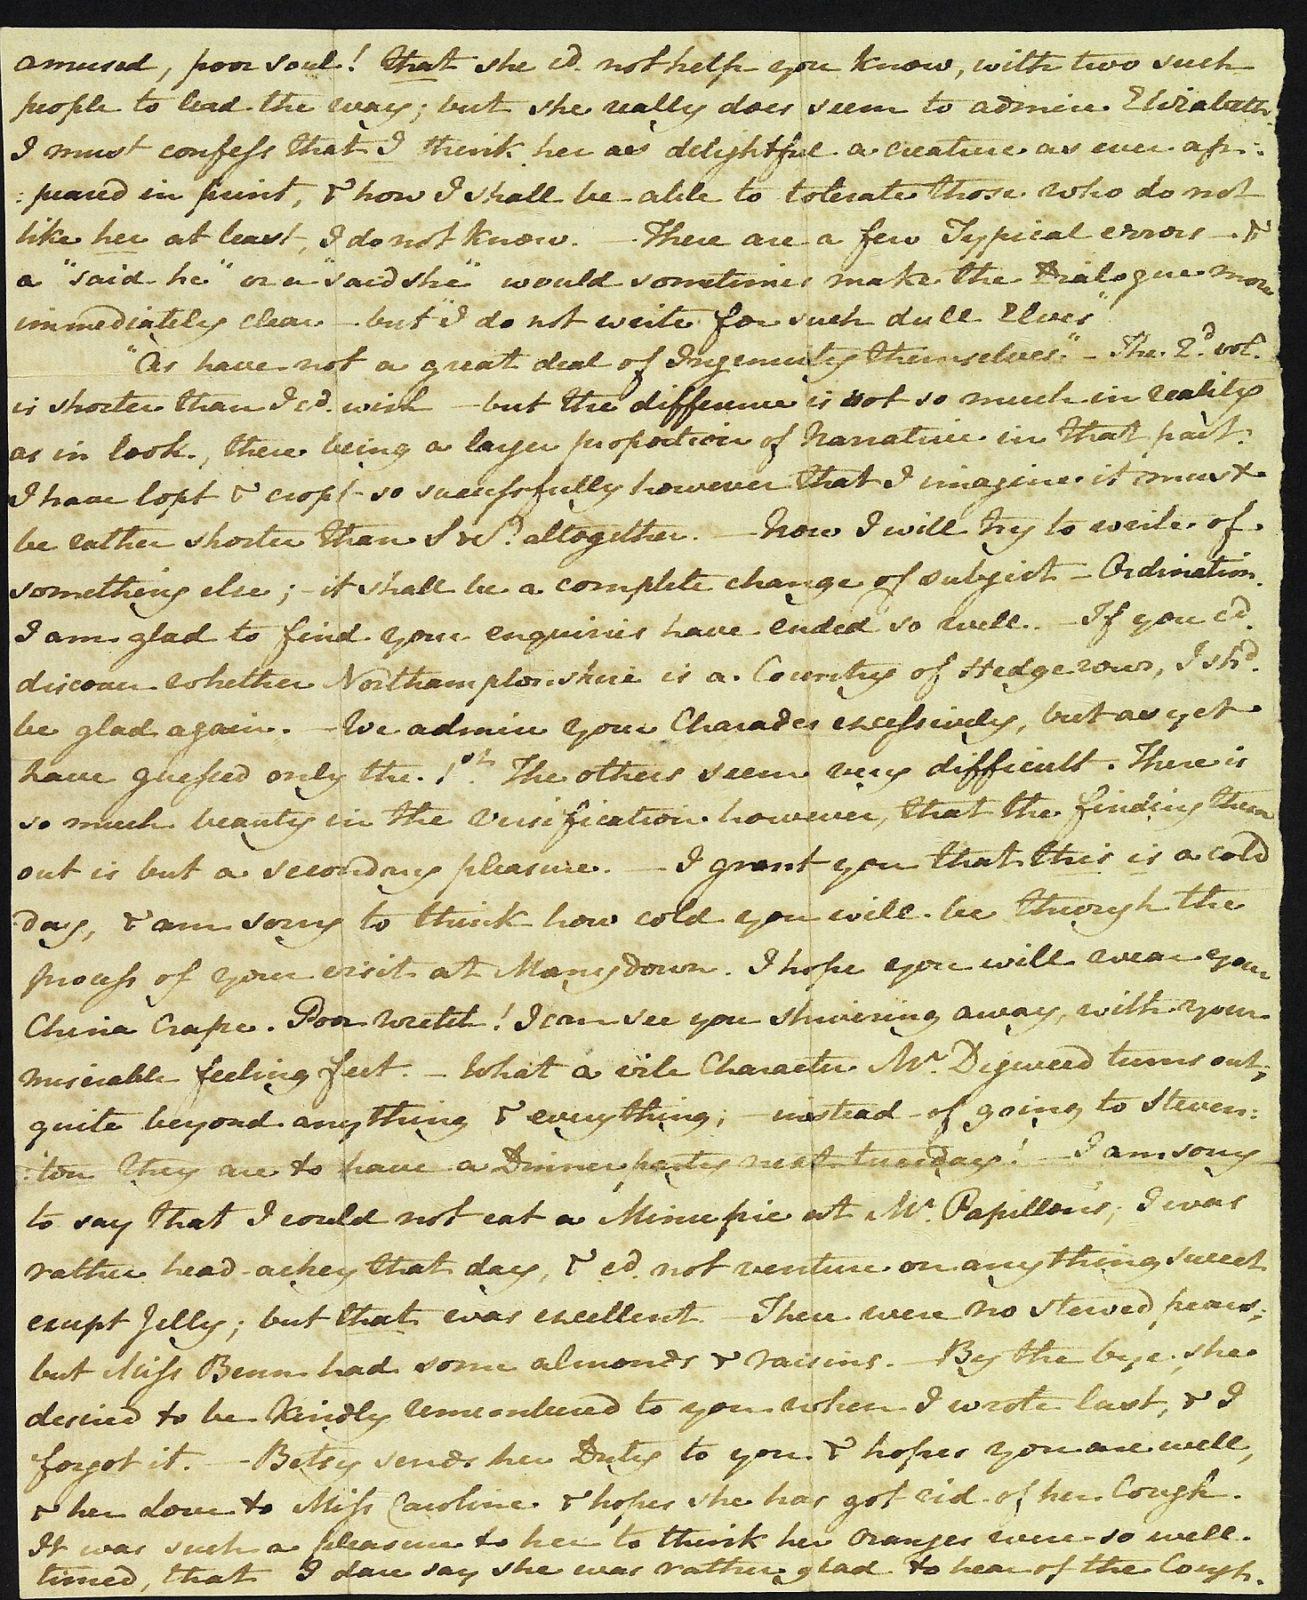 Letter from Jane Austen to Cassandra Austen, 29 January 1813. Page 2